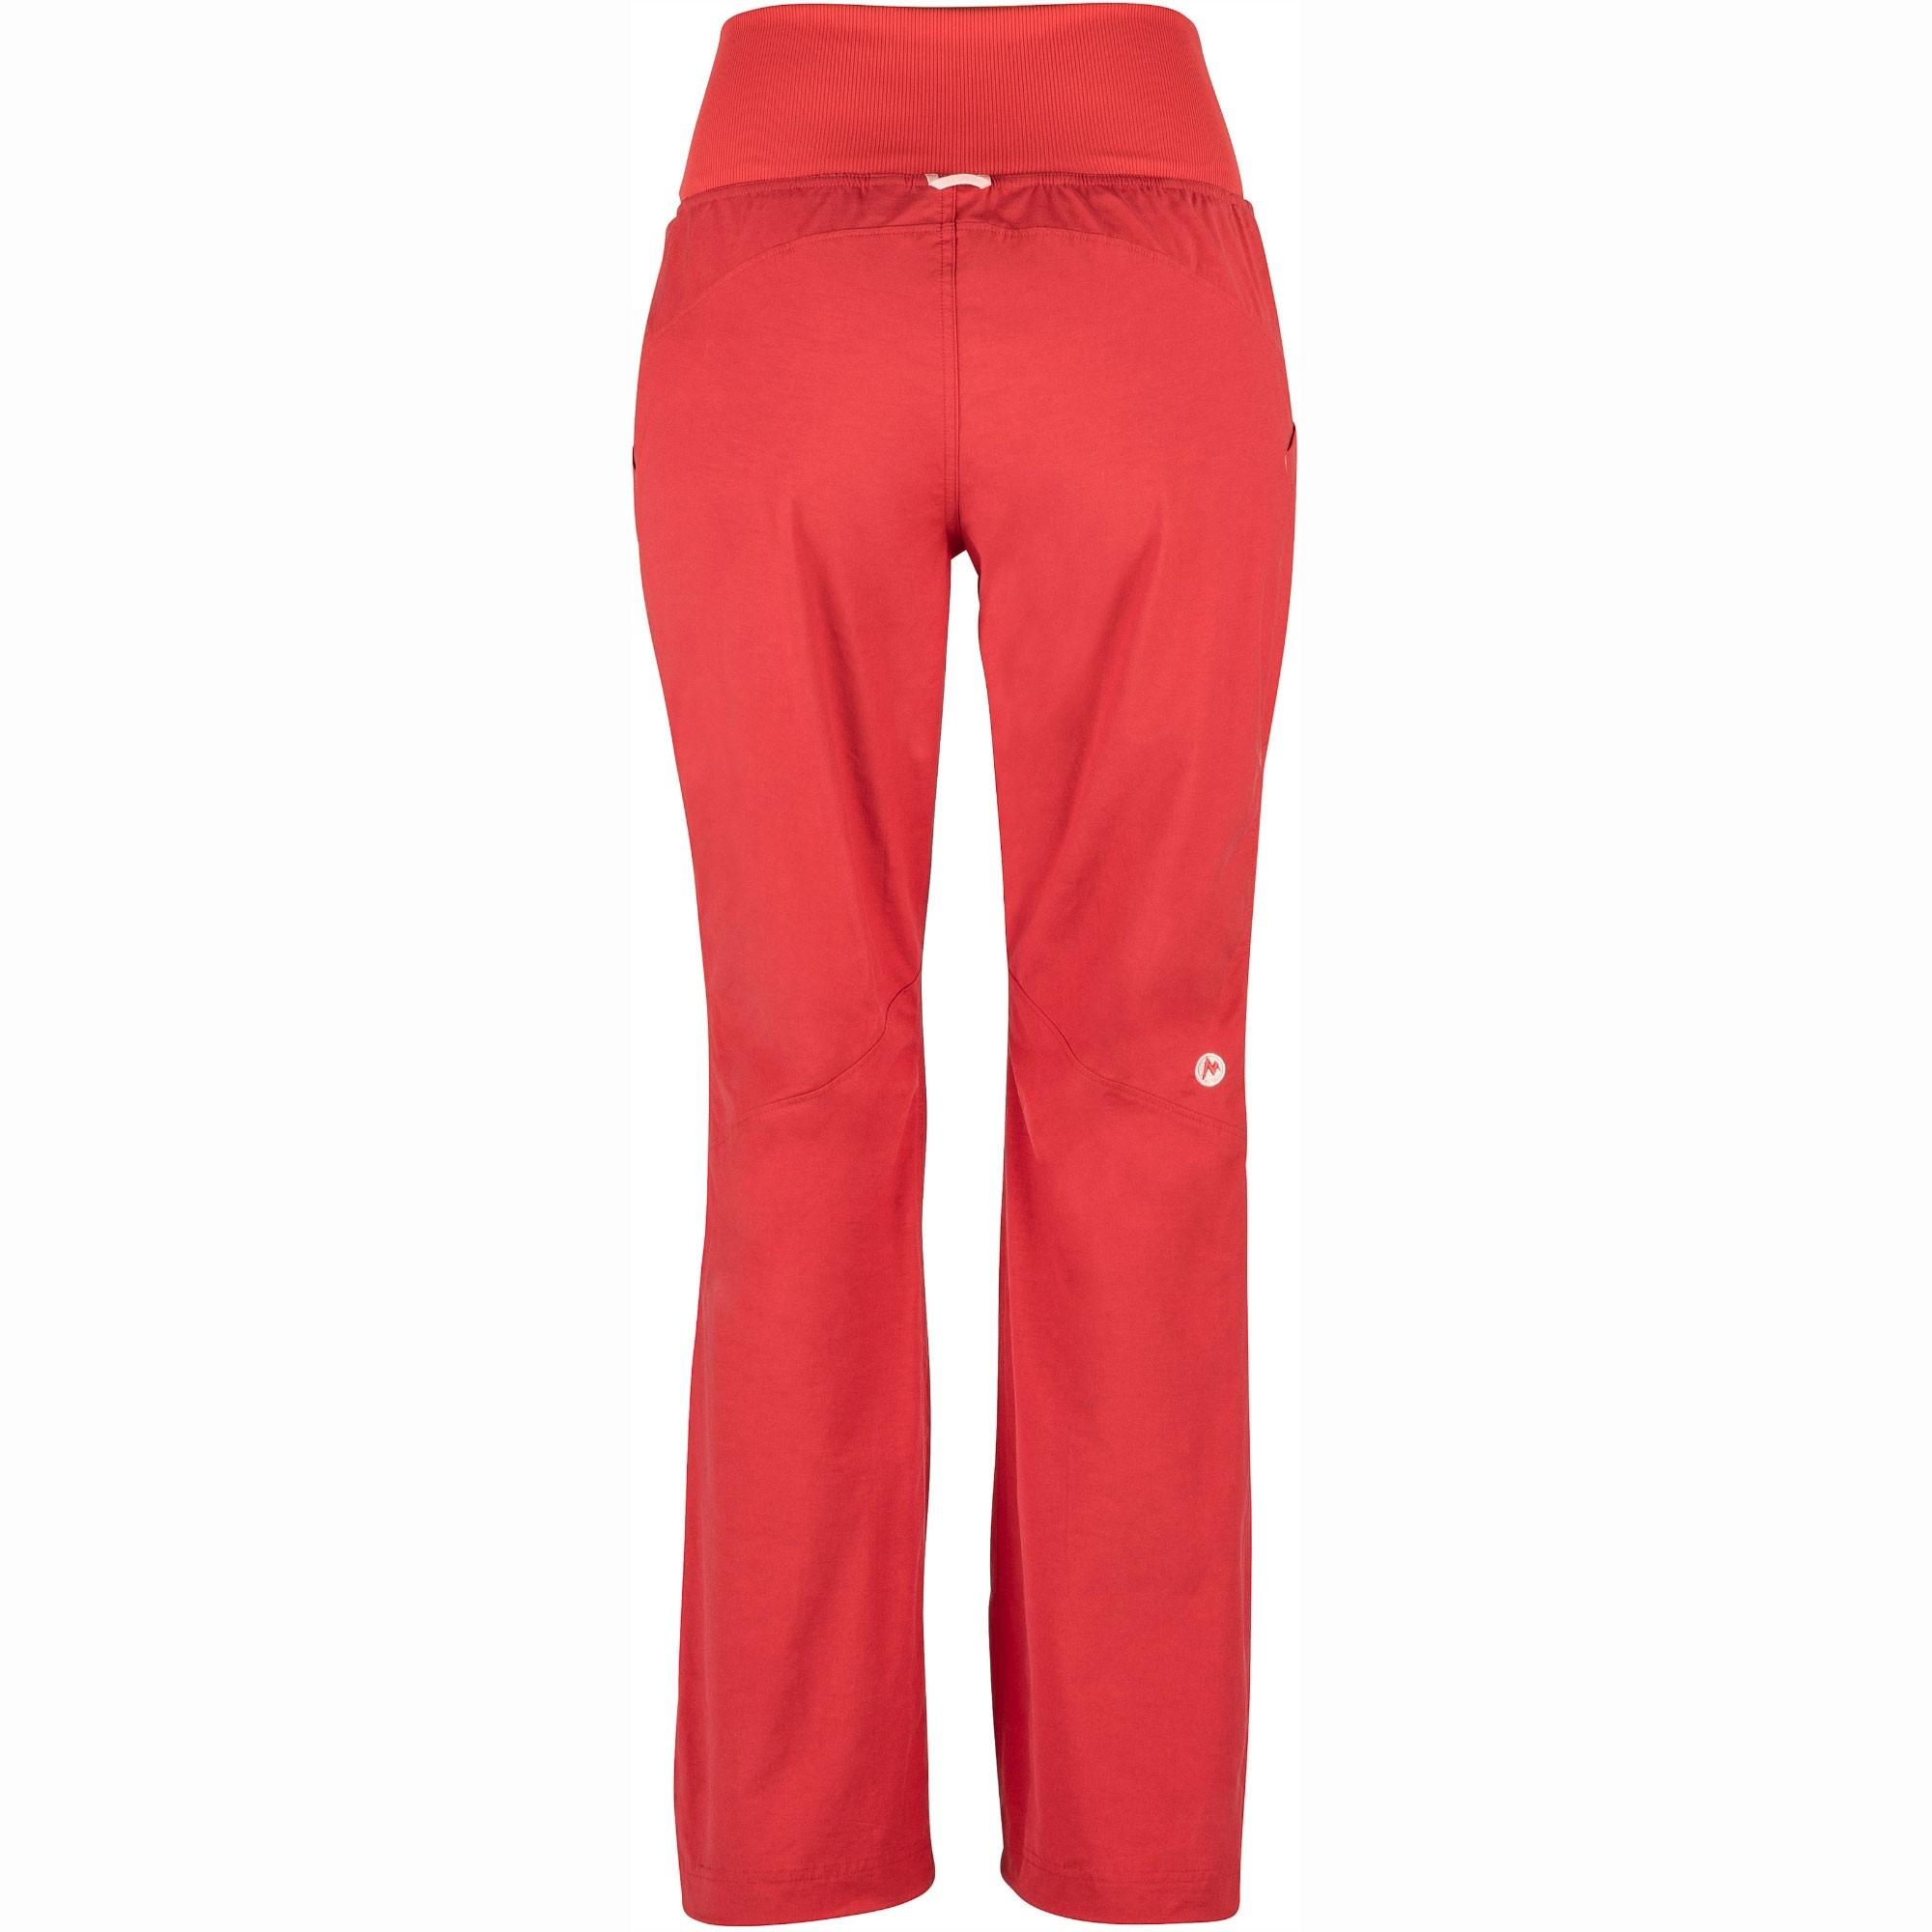 Marmot Lleida Women's Climbing Pants - Desert Red - Back